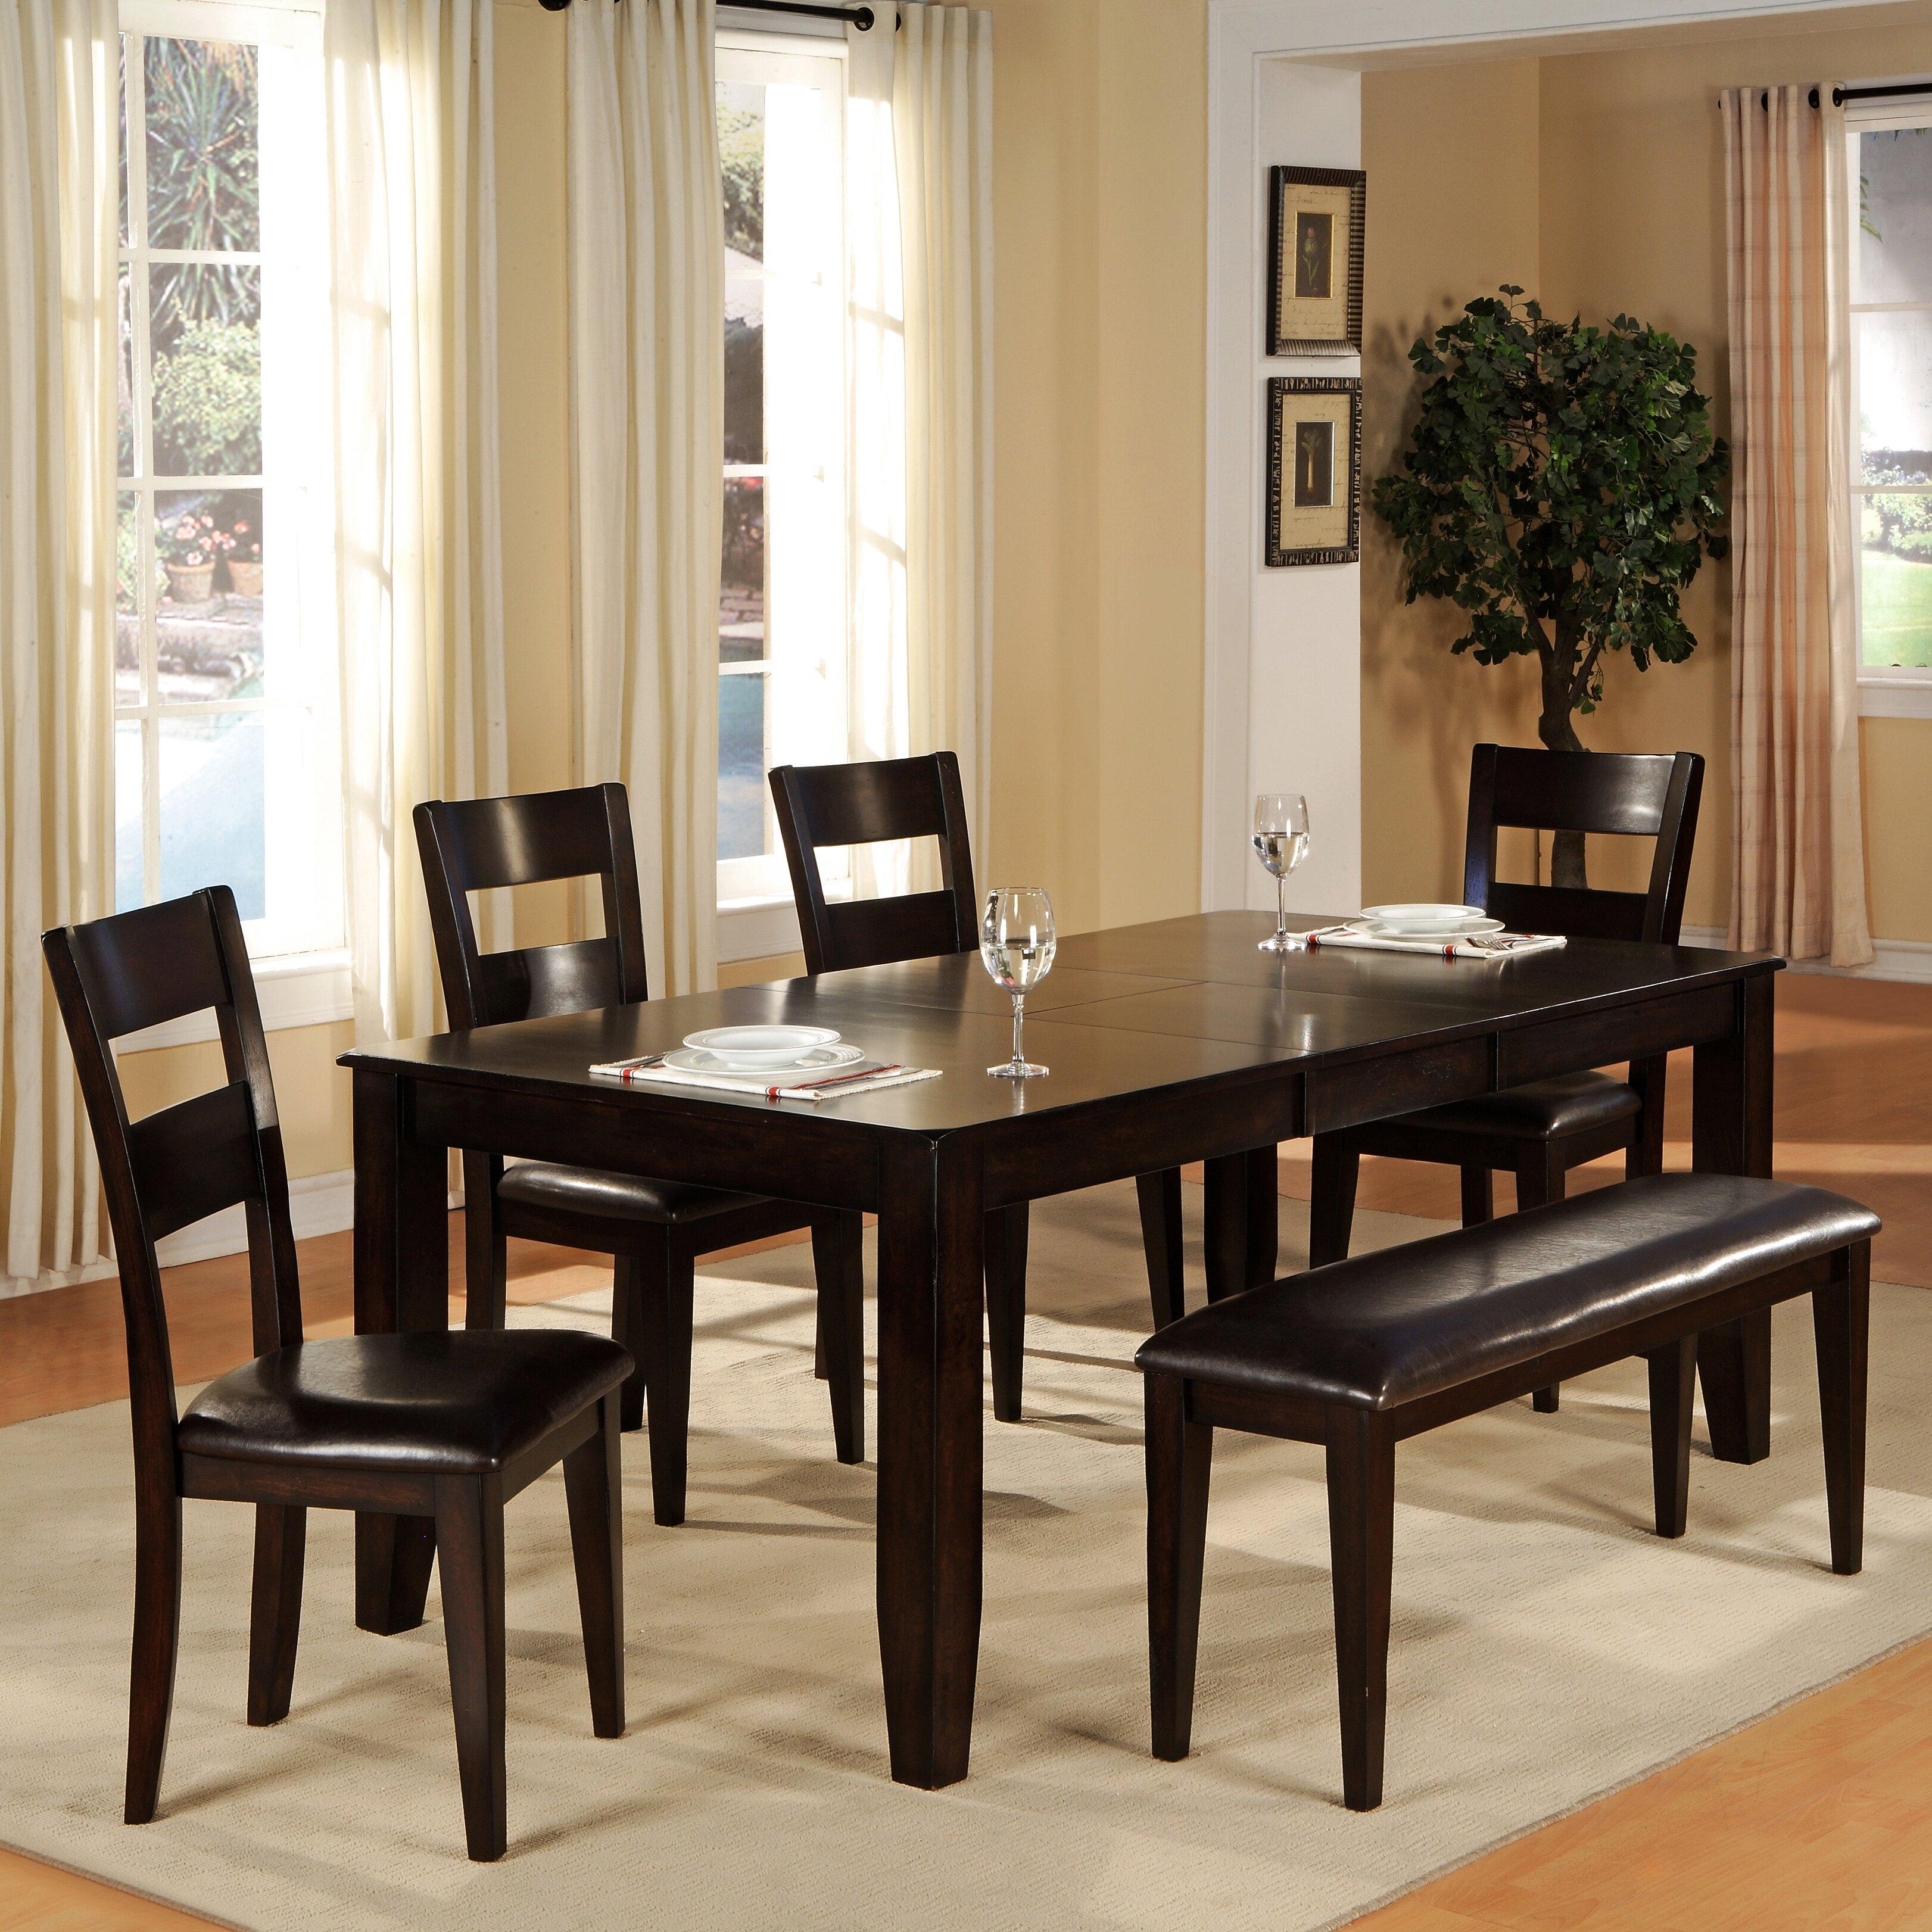 Wildon Home Dining Table Wildon Home 174 Montrose Dining  : Extendable Dining Table from amlibgroup.com size 3244 x 3244 jpeg 2281kB